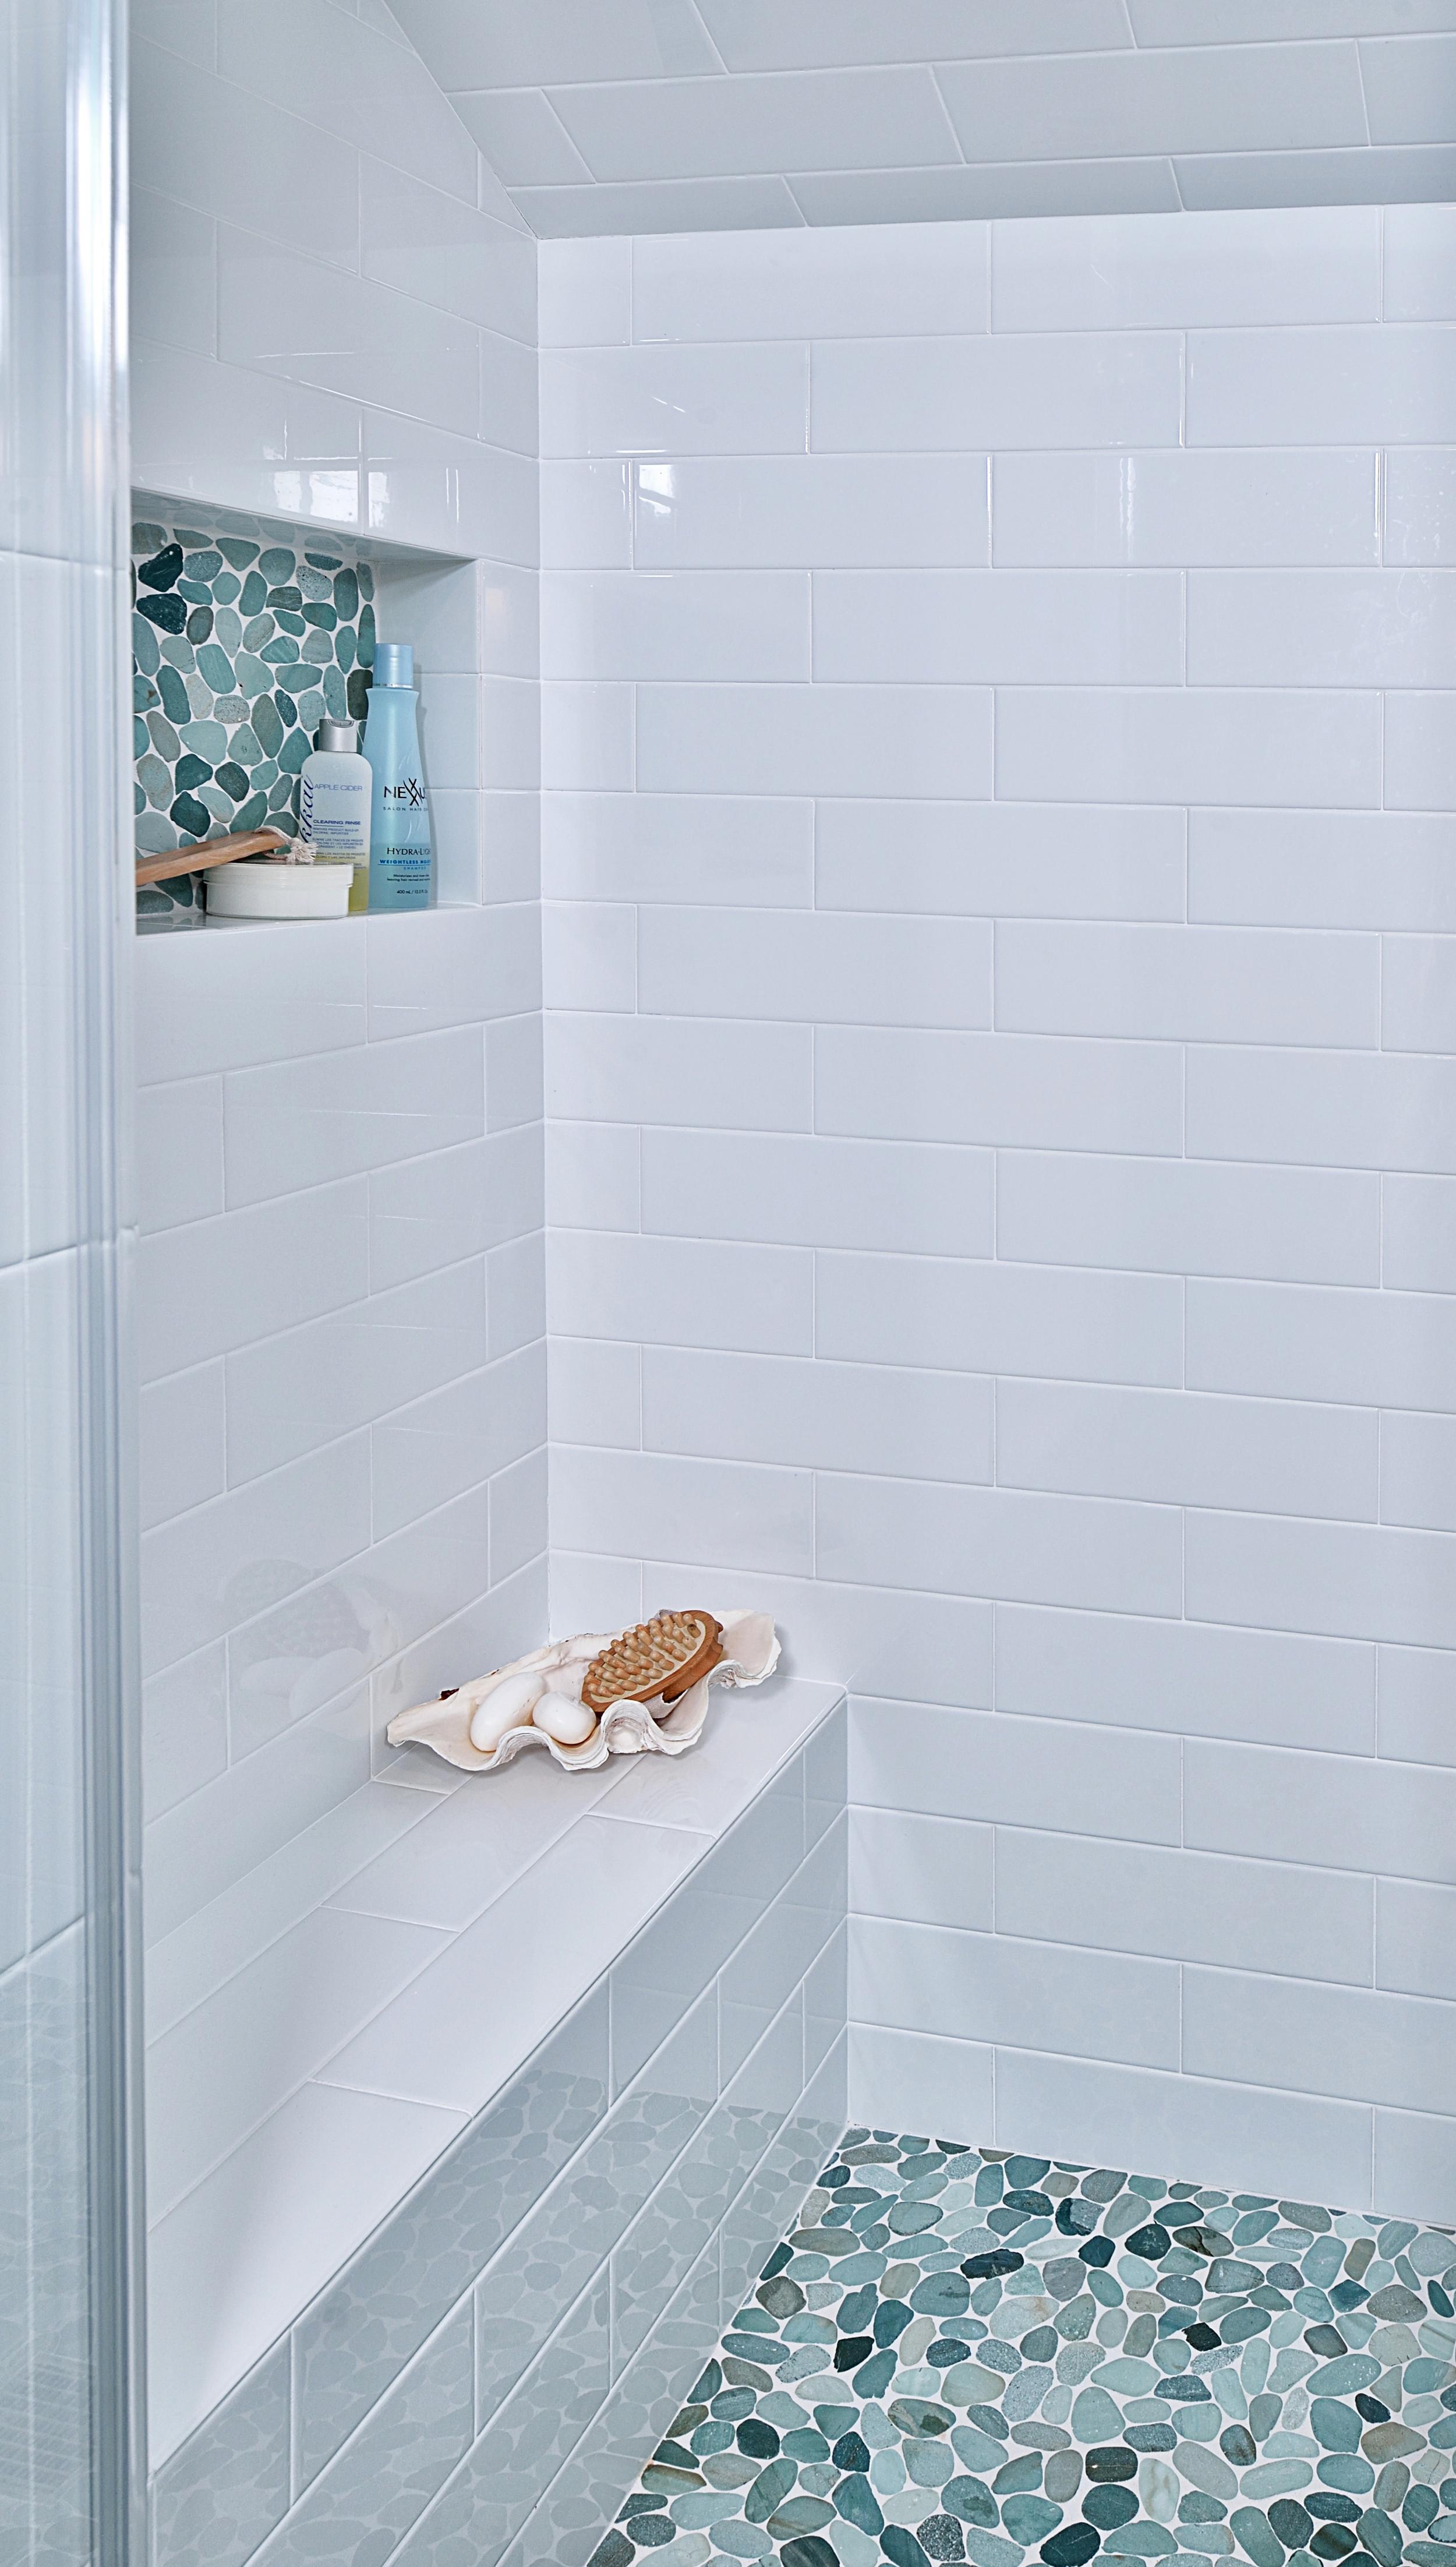 Tiffany blue girl bathroom remodel, pebble tile in shampoo niche and floor, Designer: Carla Aston